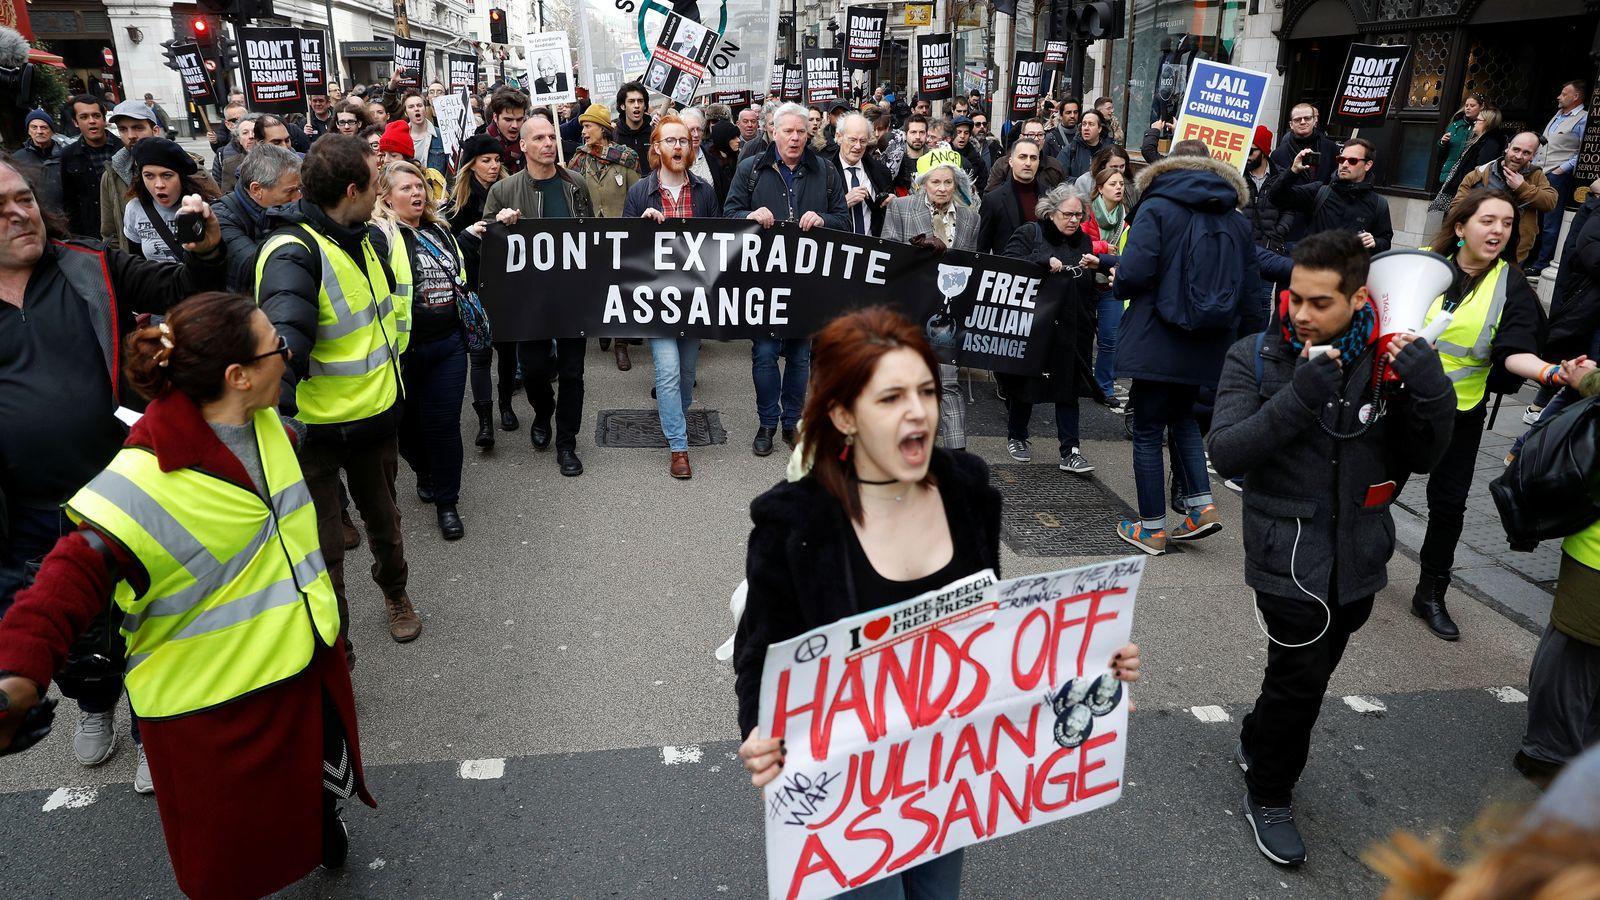 skynews-assange-extradition_4927984.jpg